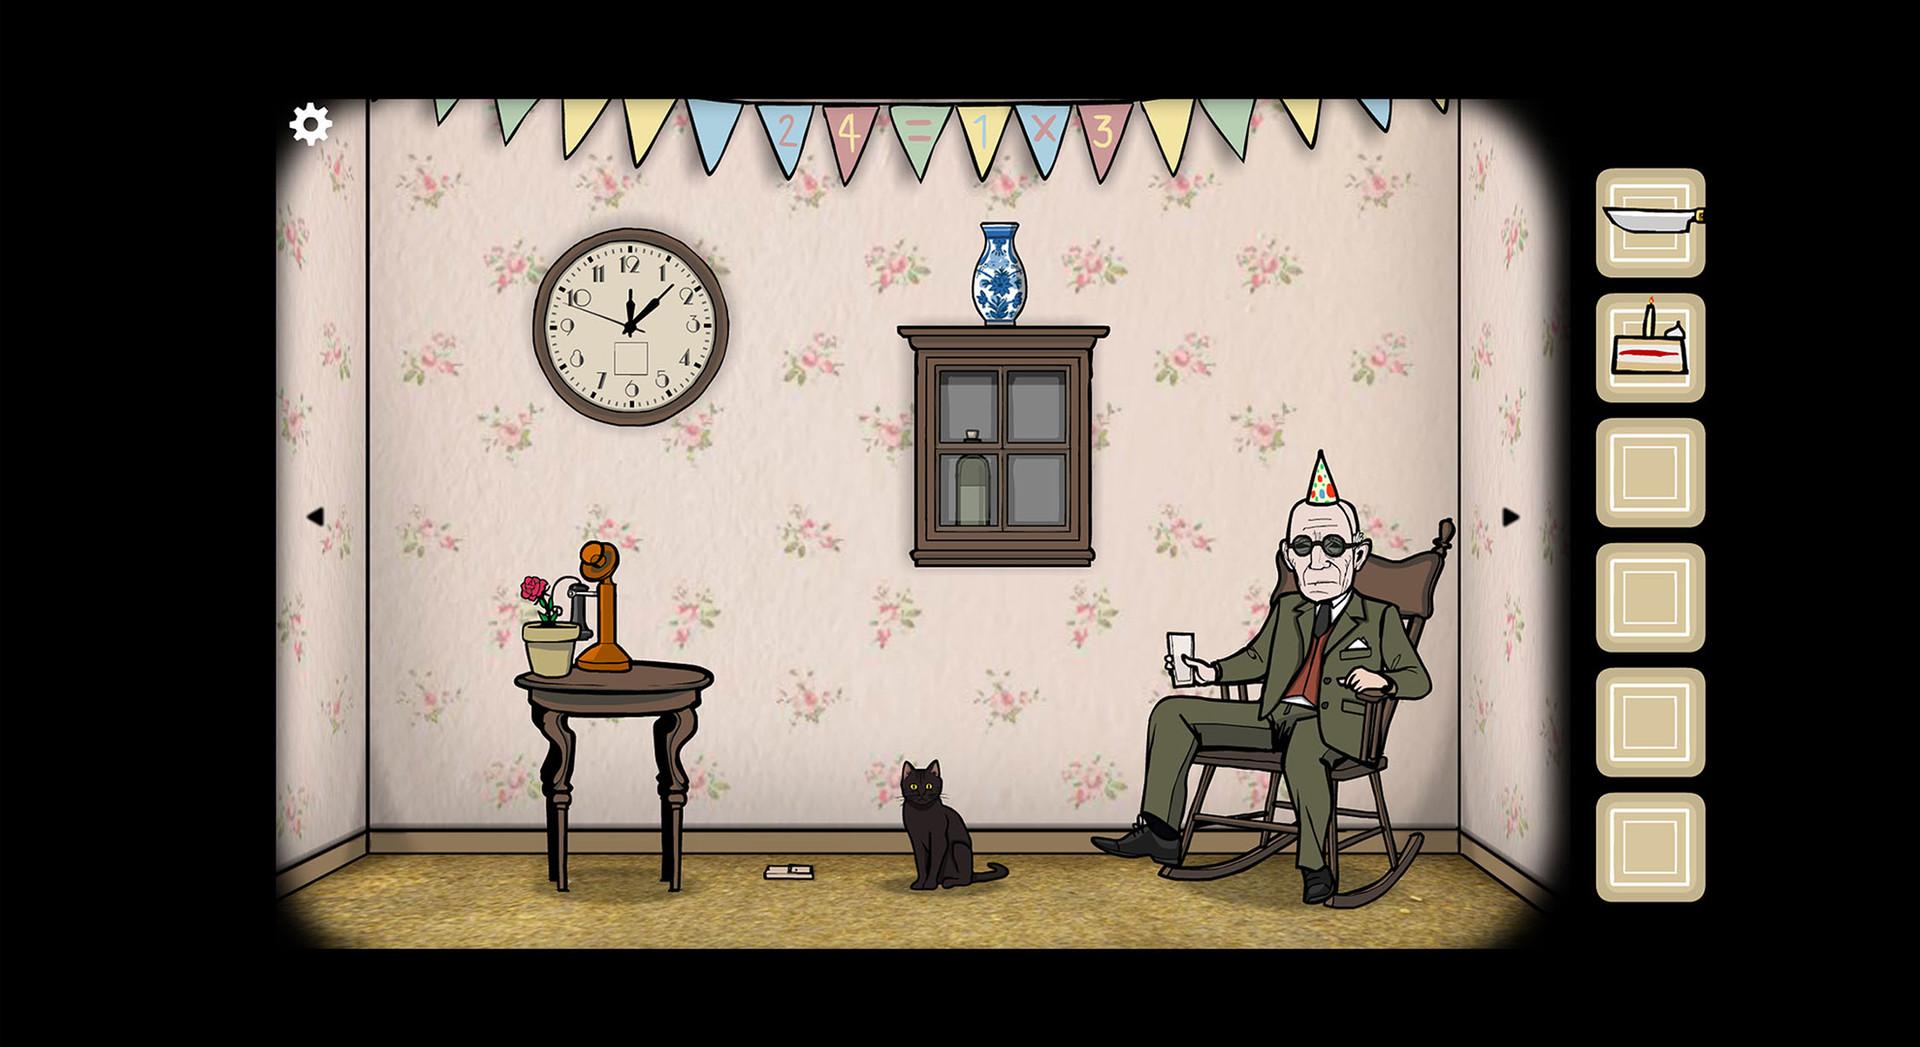 cube-escape-collection-pc-screenshot-02